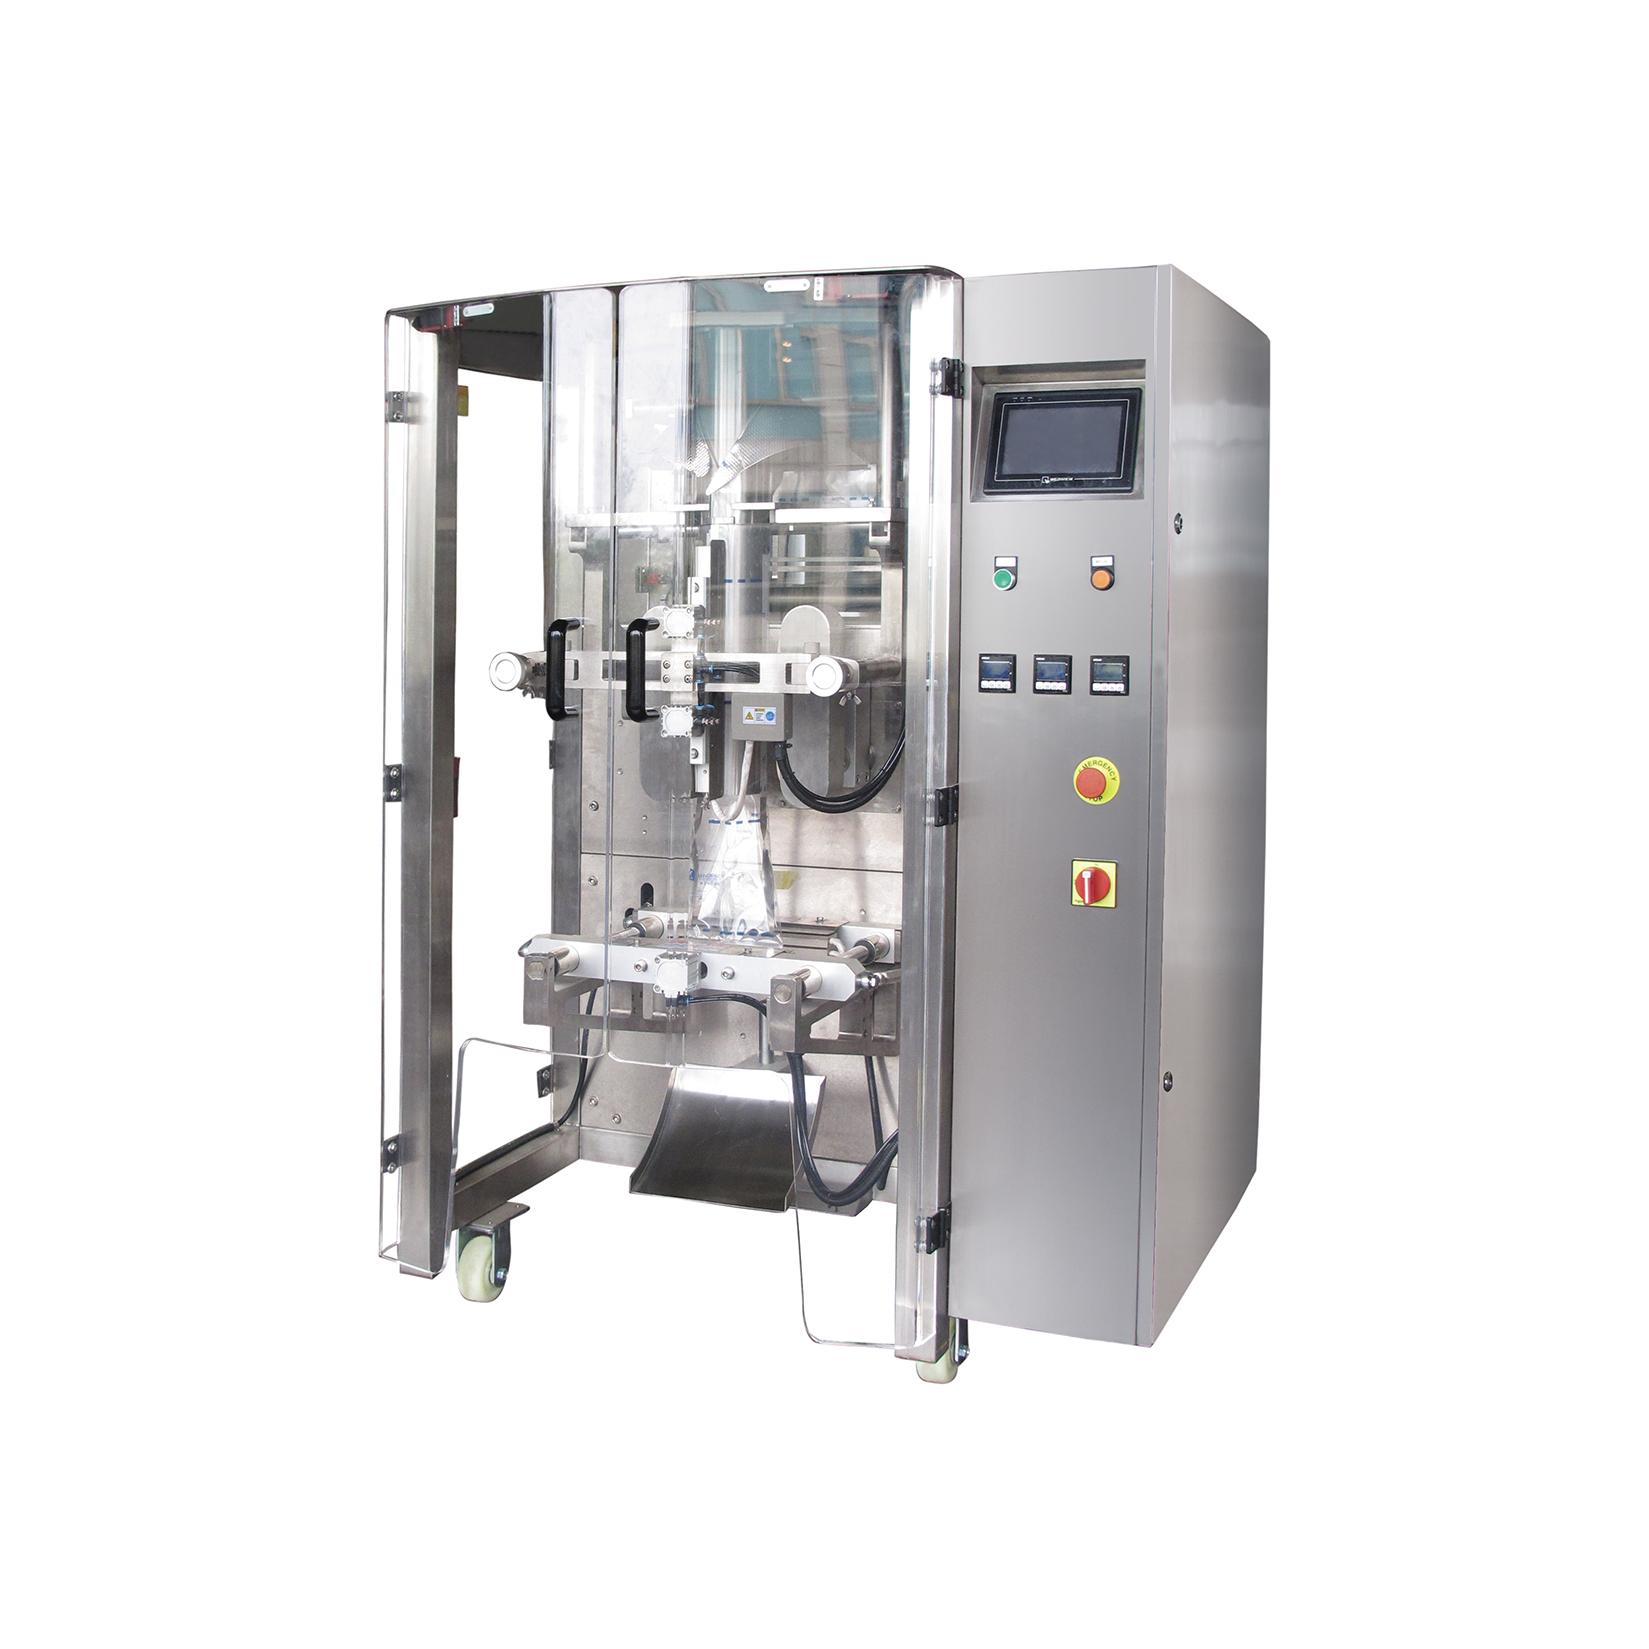 VFFS machine – V250